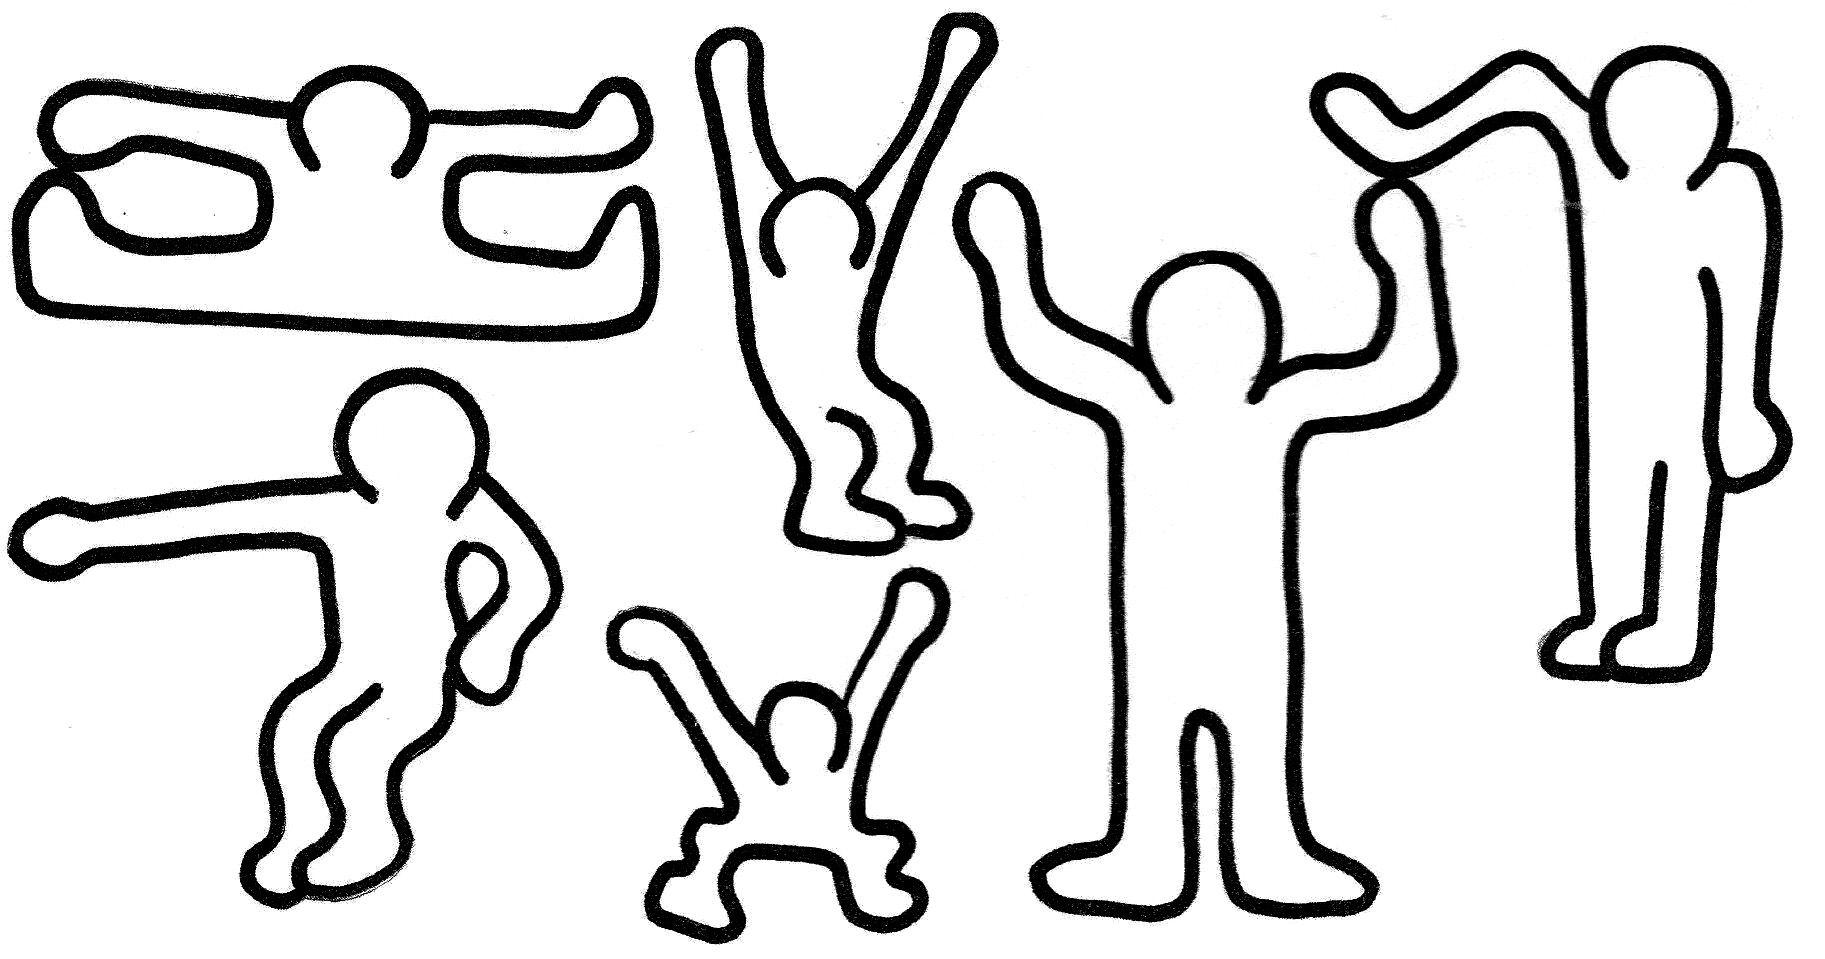 Keith Haring - Validées   Kunst, Kunststunden über Keith Haring Malvorlagen